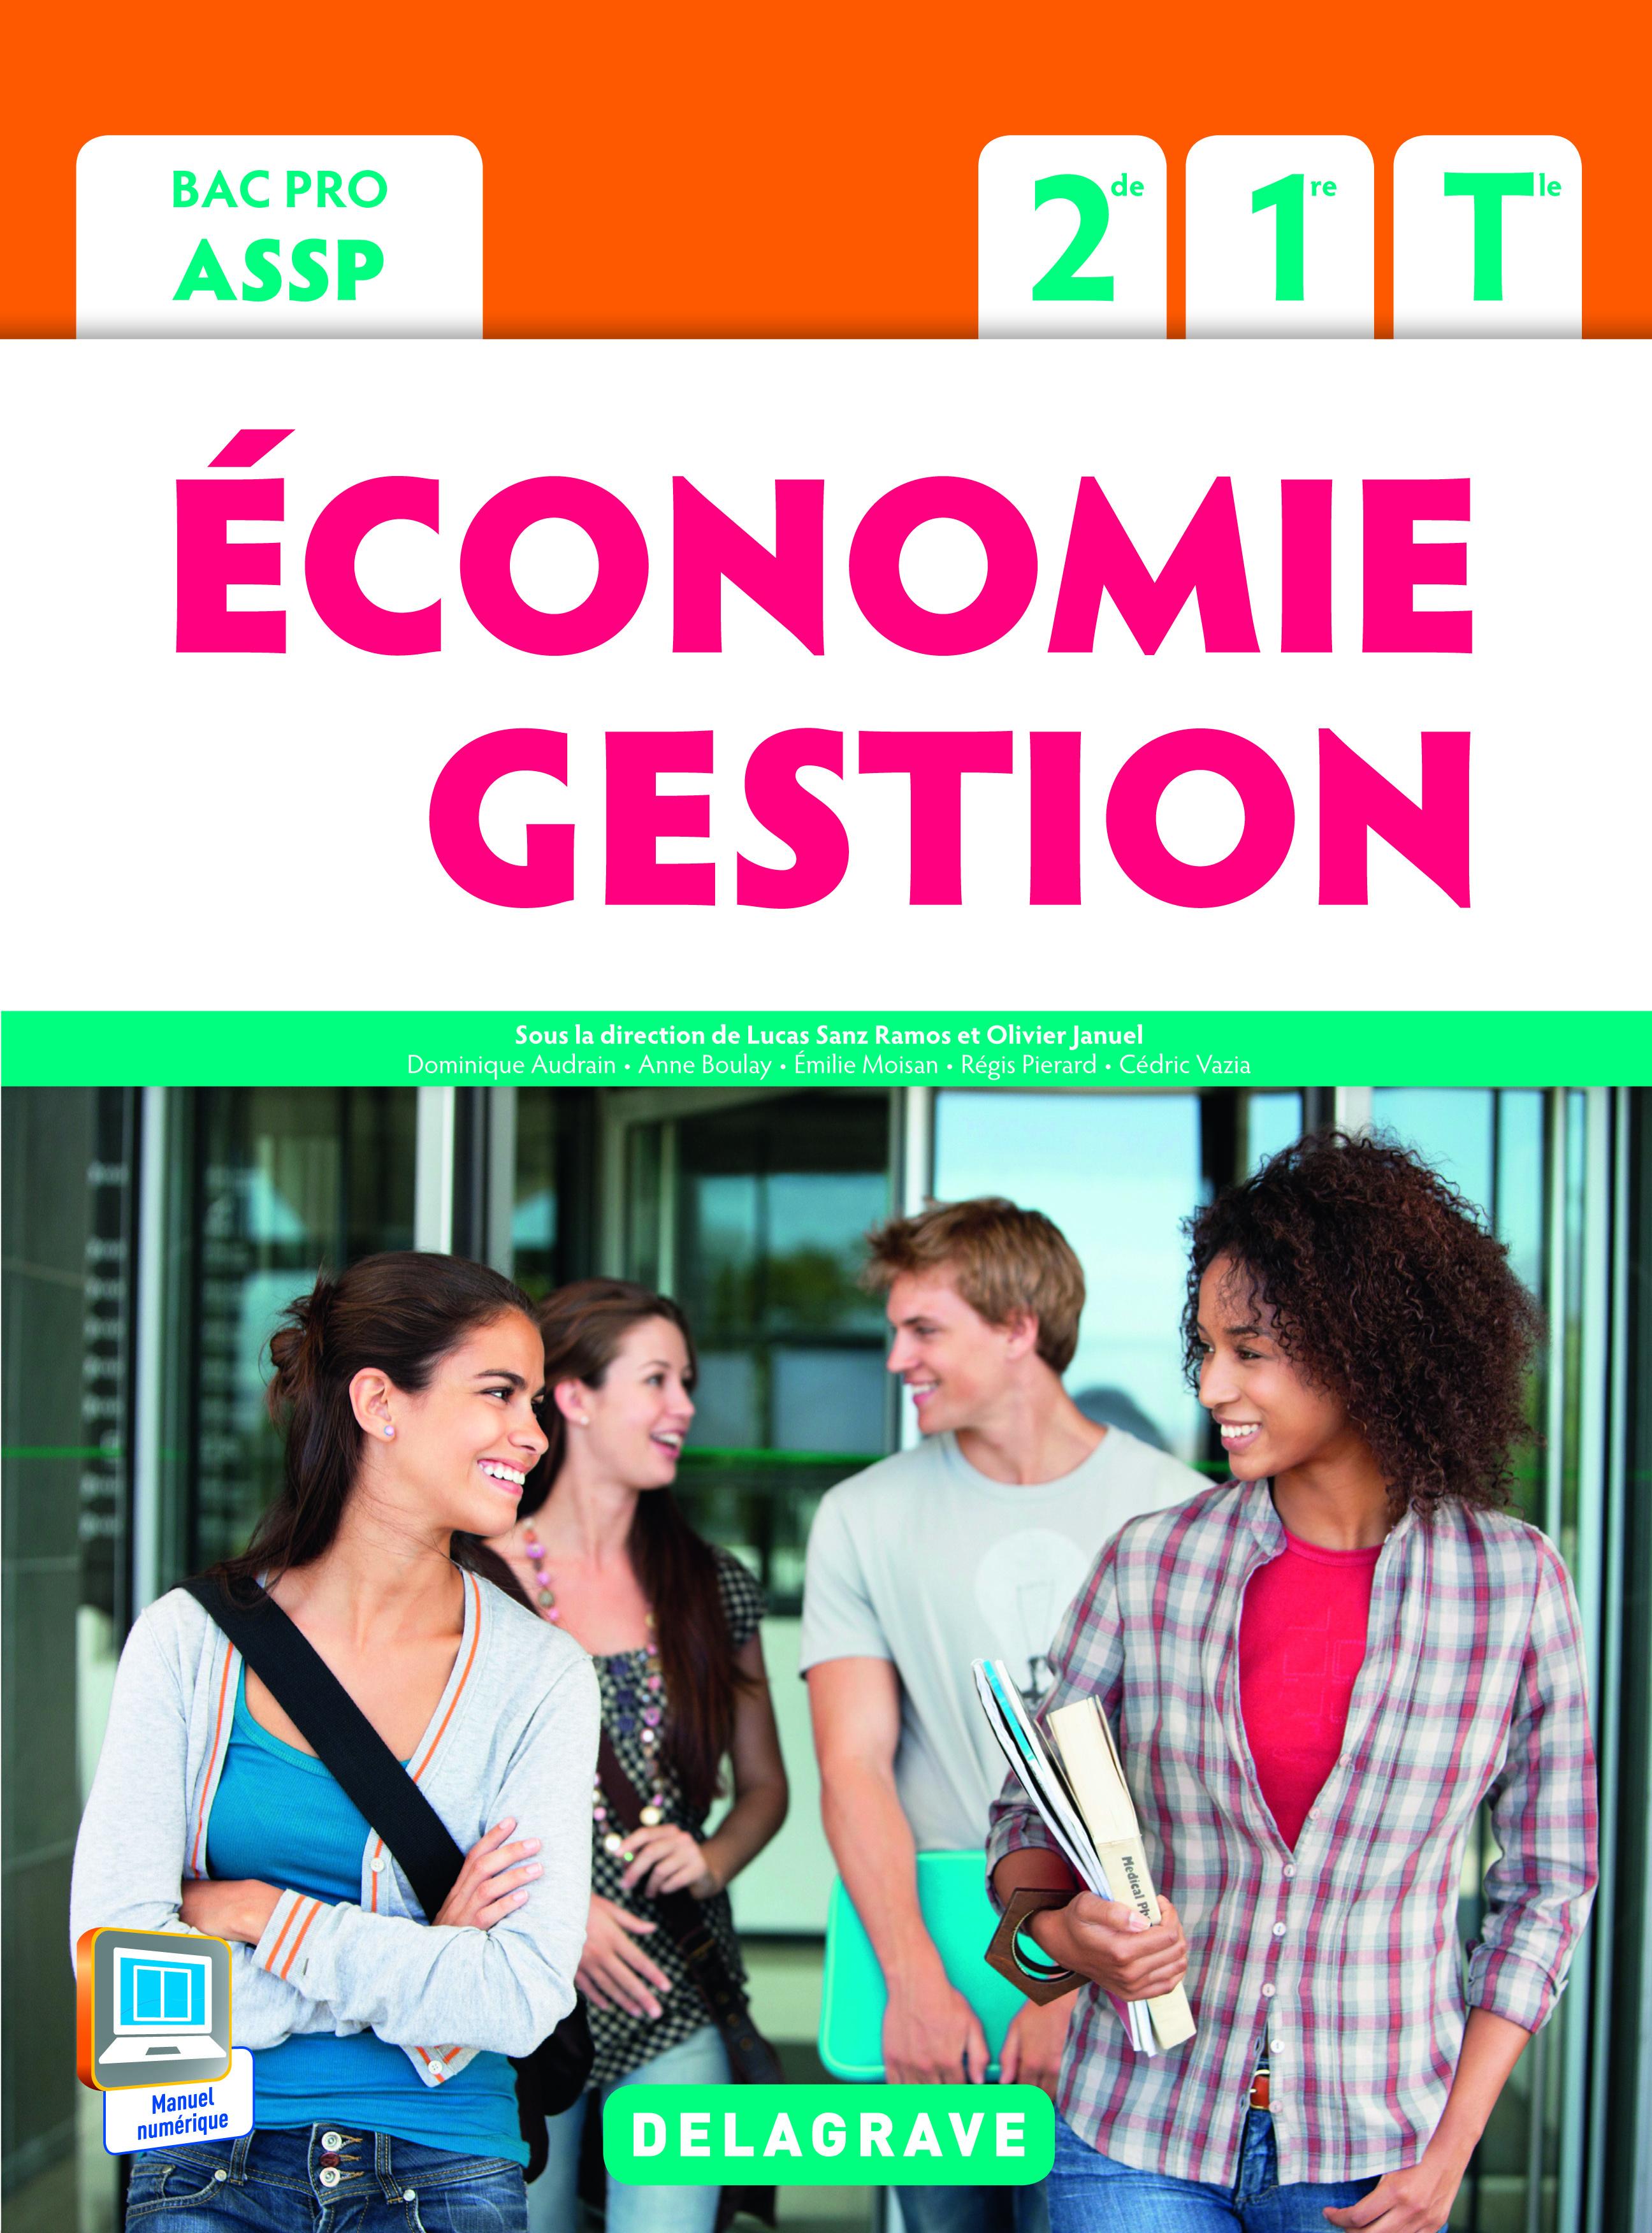 ECONOMIE GESTION 2E 1E TERM BAC PRO ASSP ELEVE